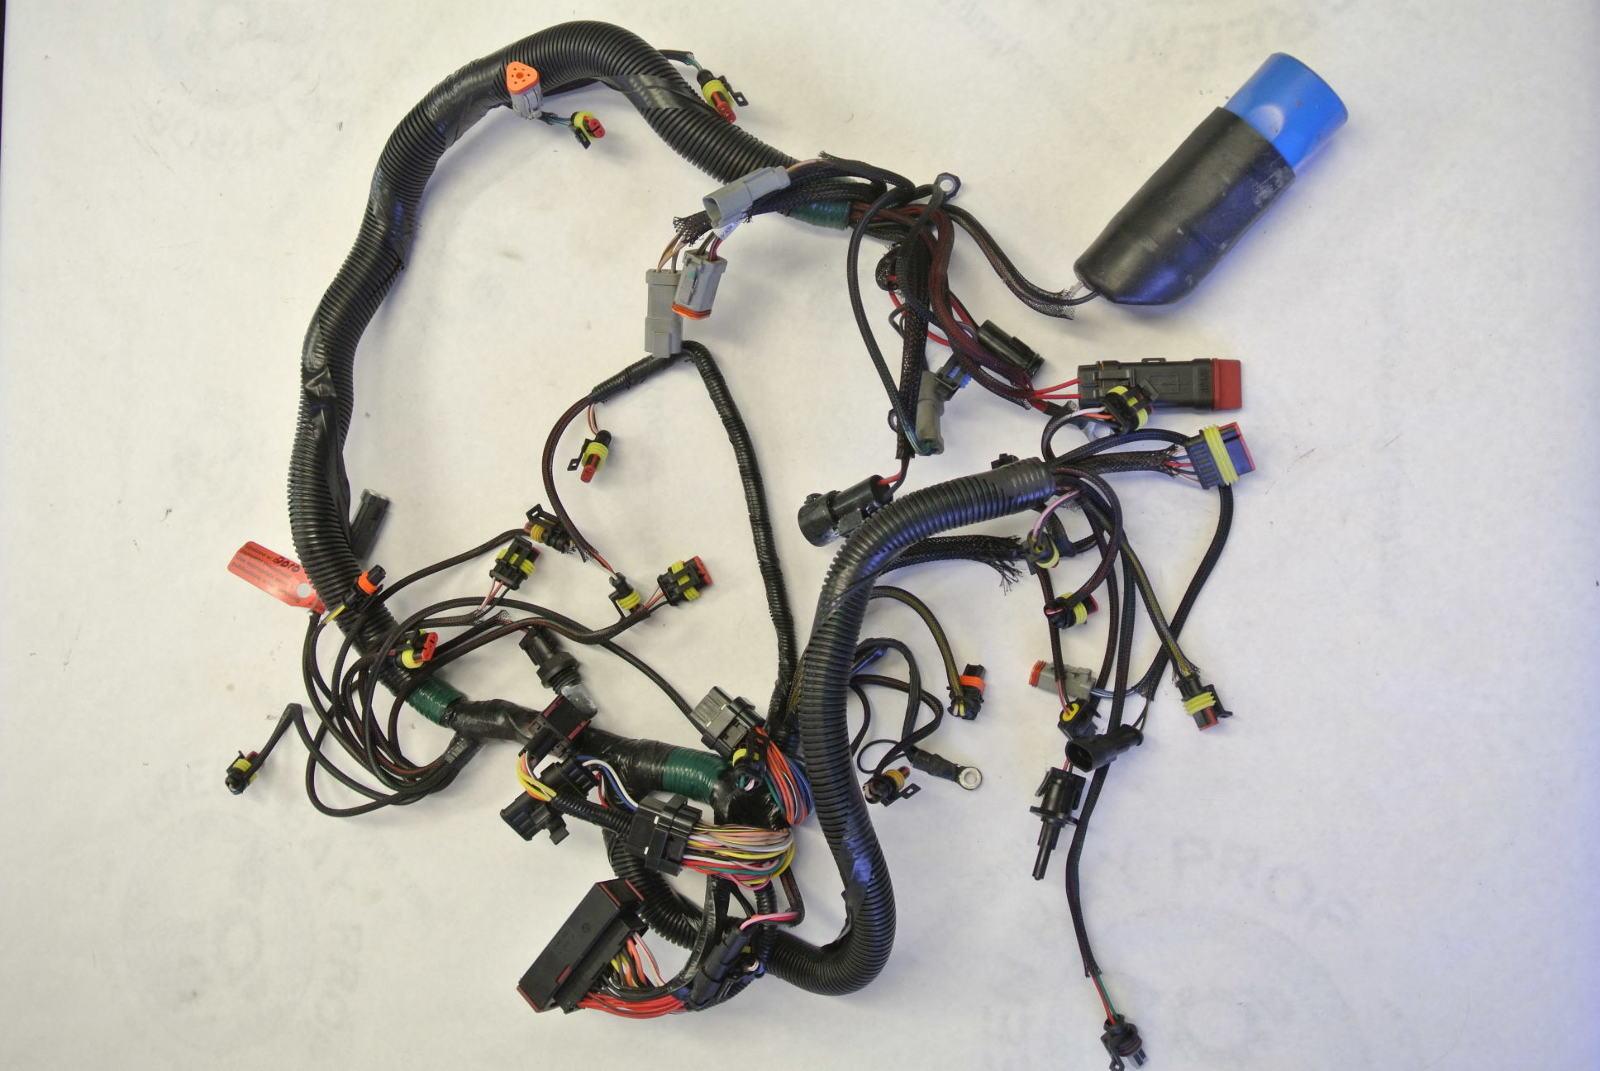 Oo 6065 Evinrude Wiring Harness Connectors Free Diagram